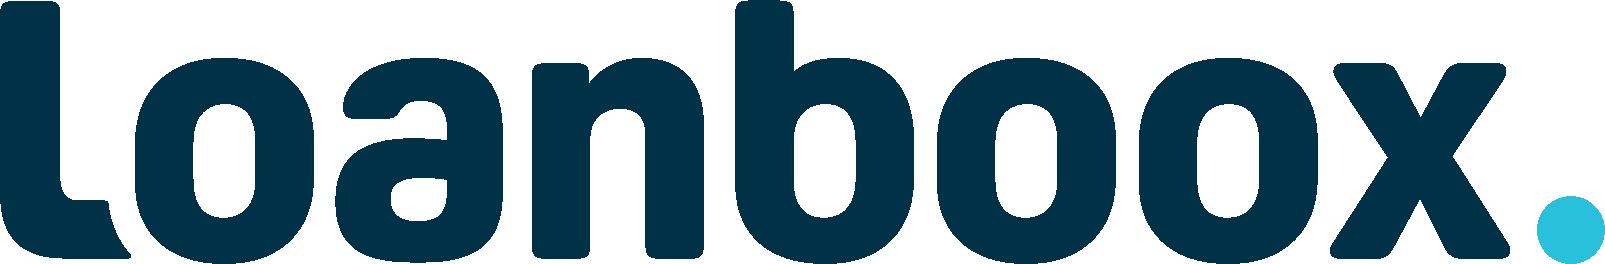 Loanboox logo color